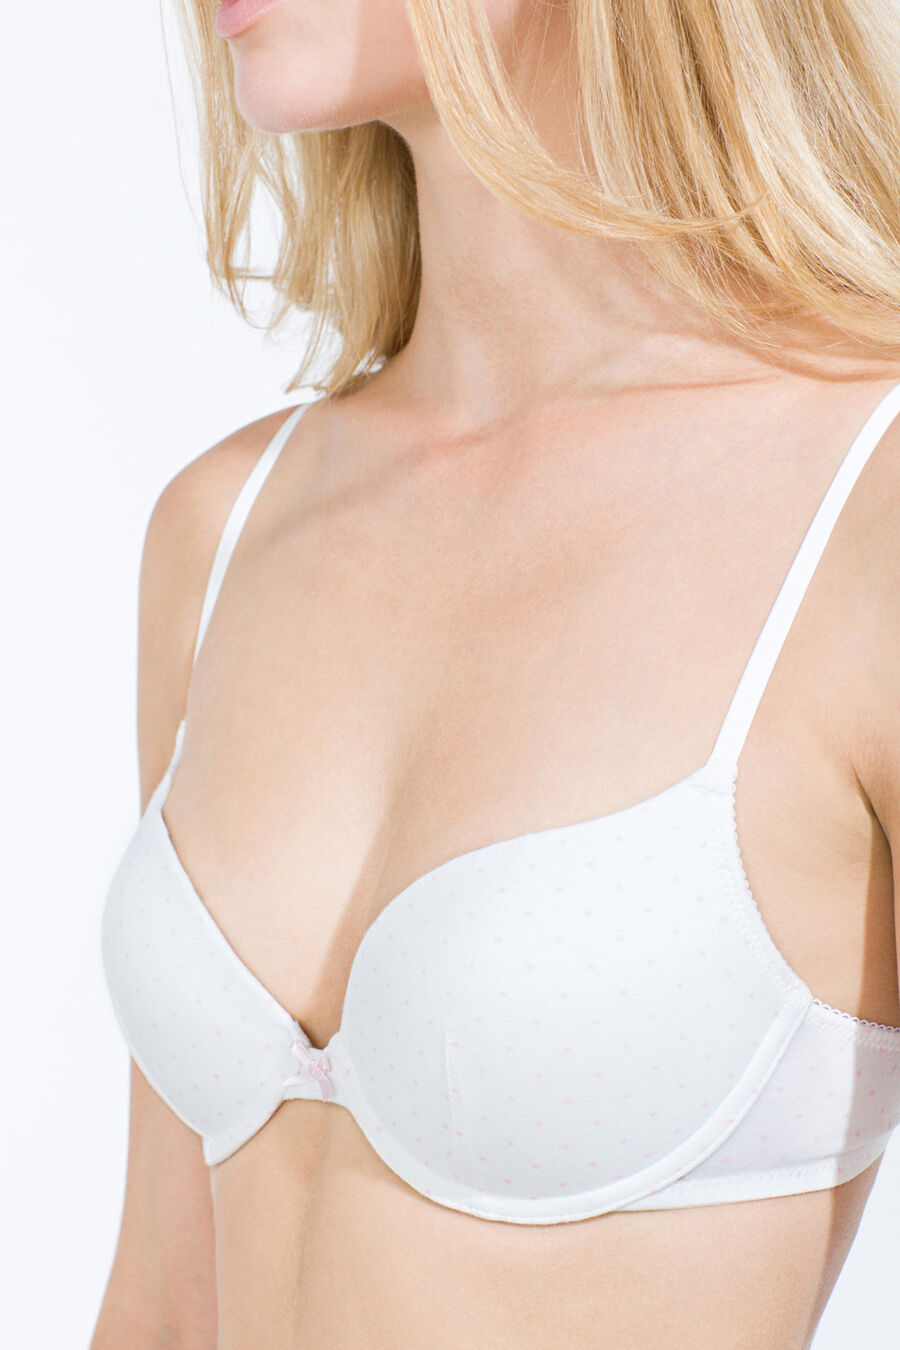 Polka dot push up bra